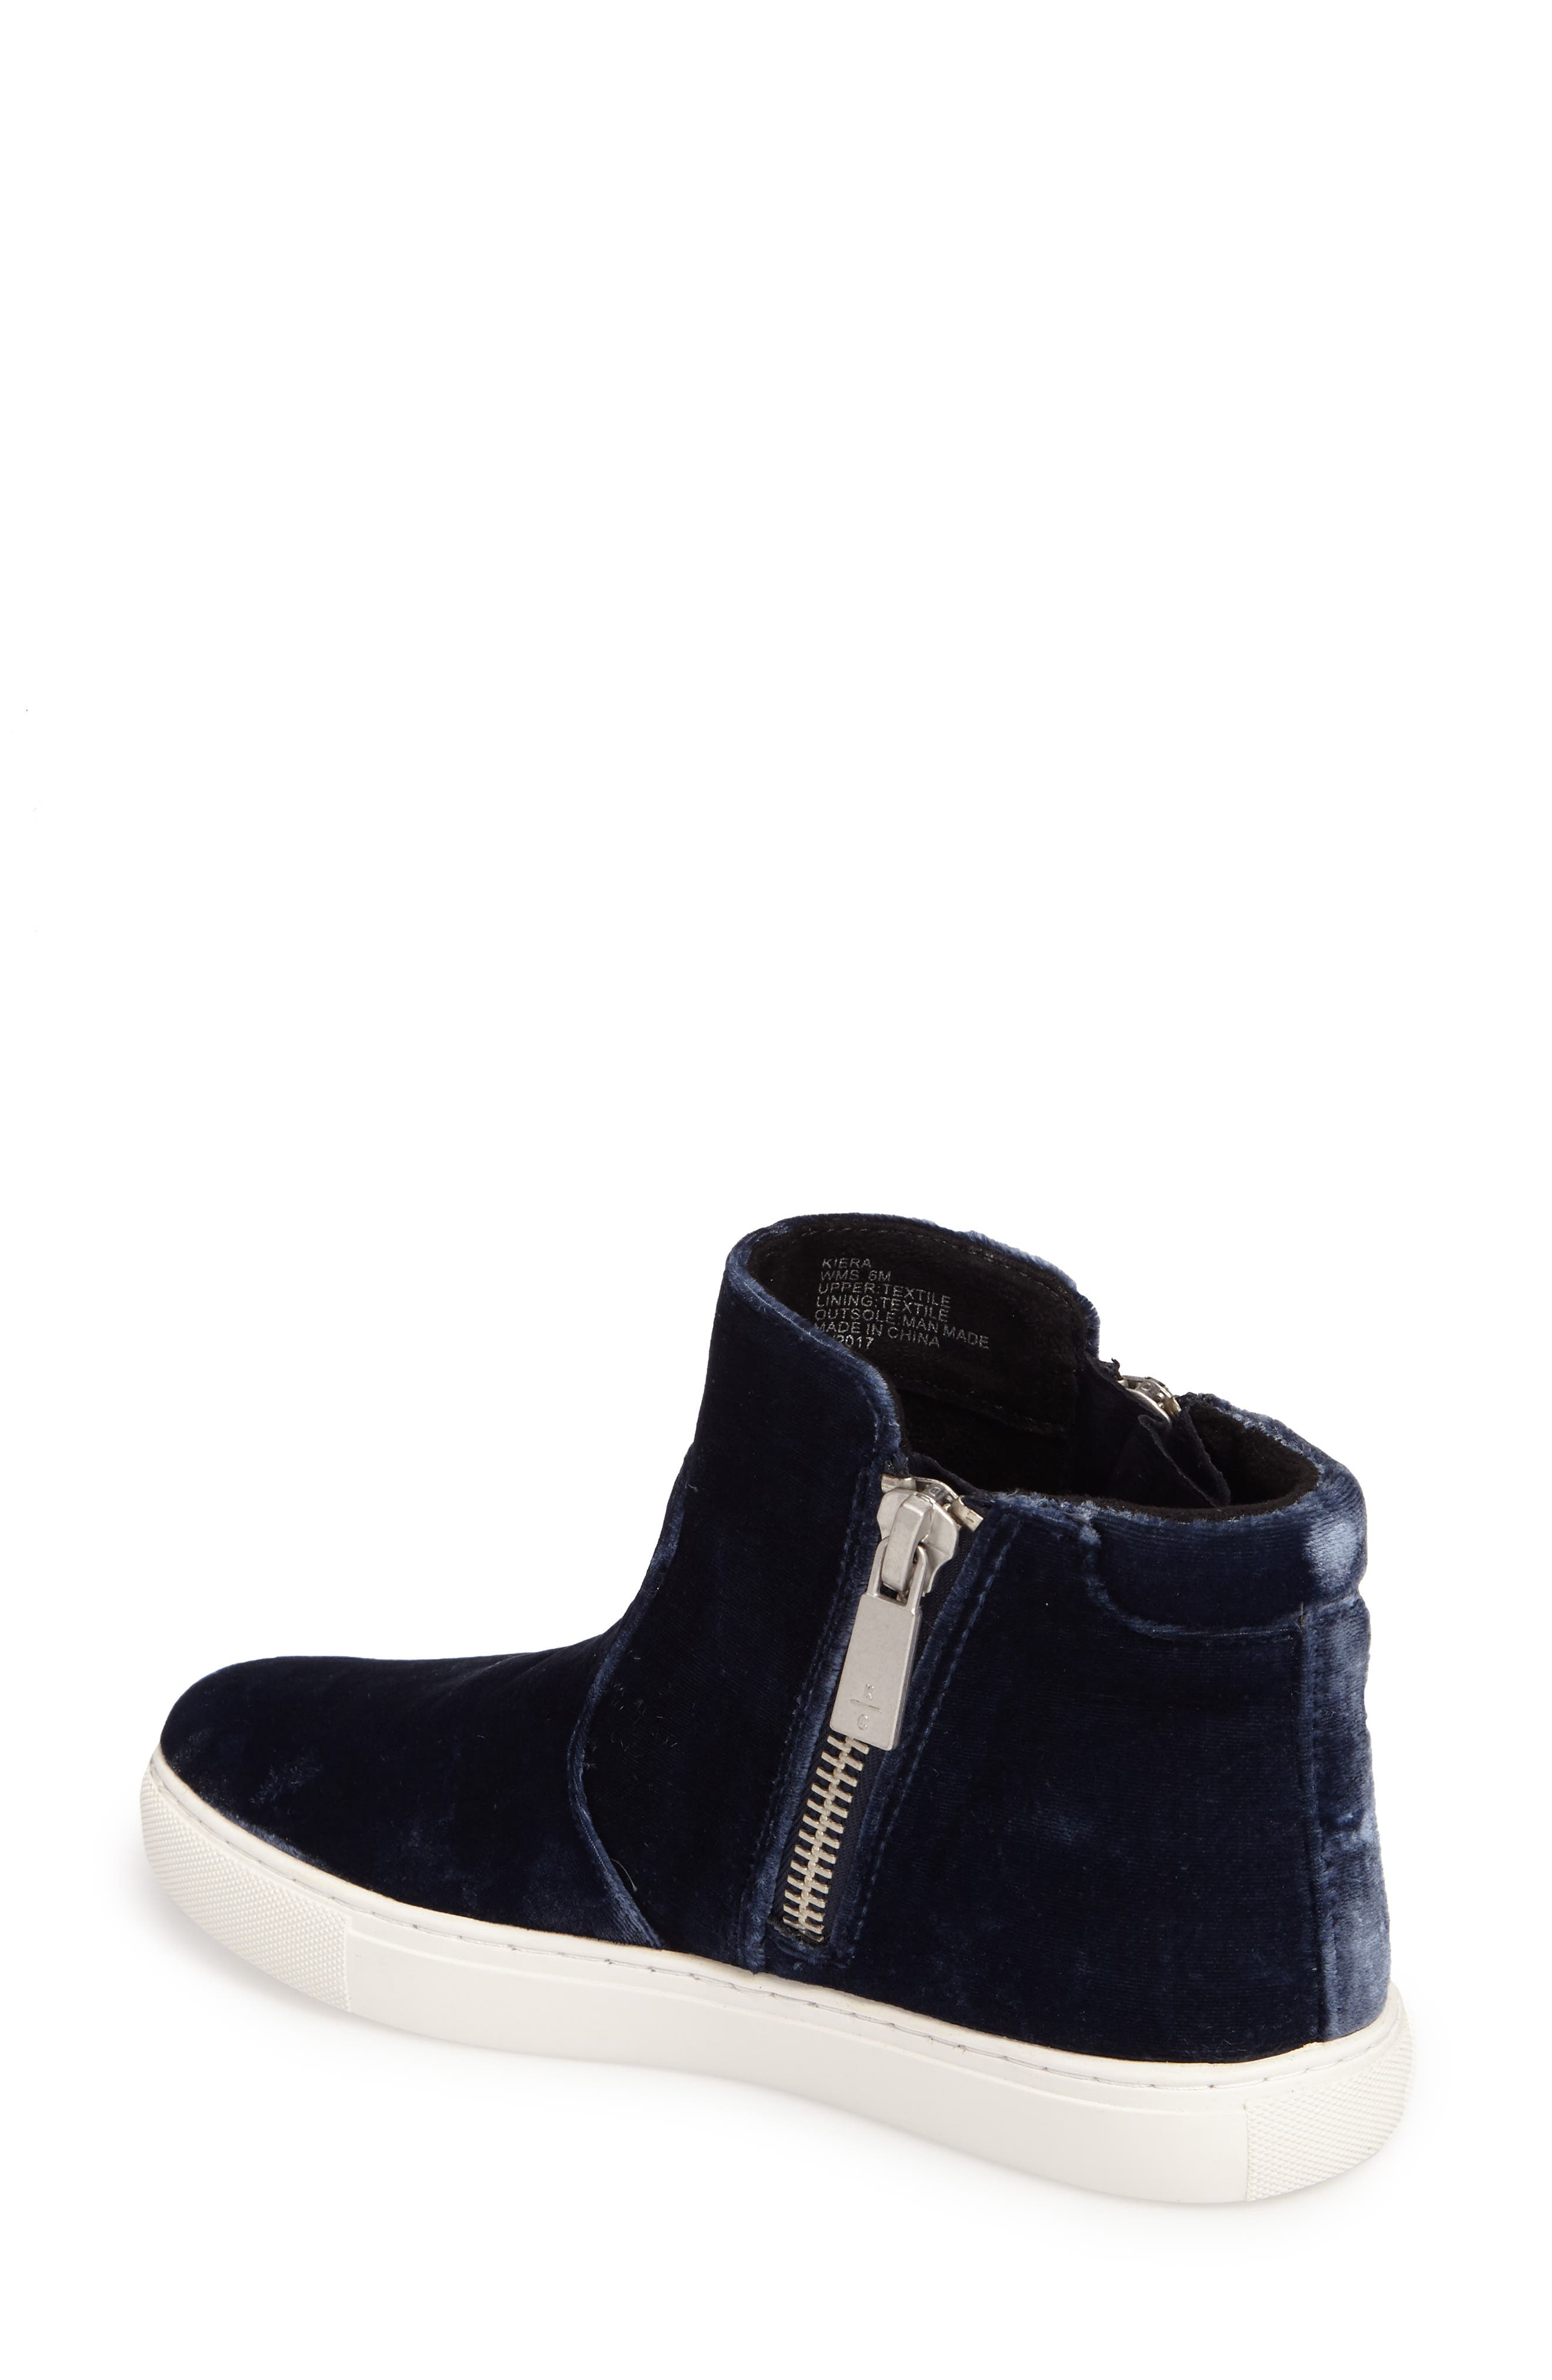 Alternate Image 2  - Kenneth Cole New York 'Kiera' Zip High Top Sneaker (Women)